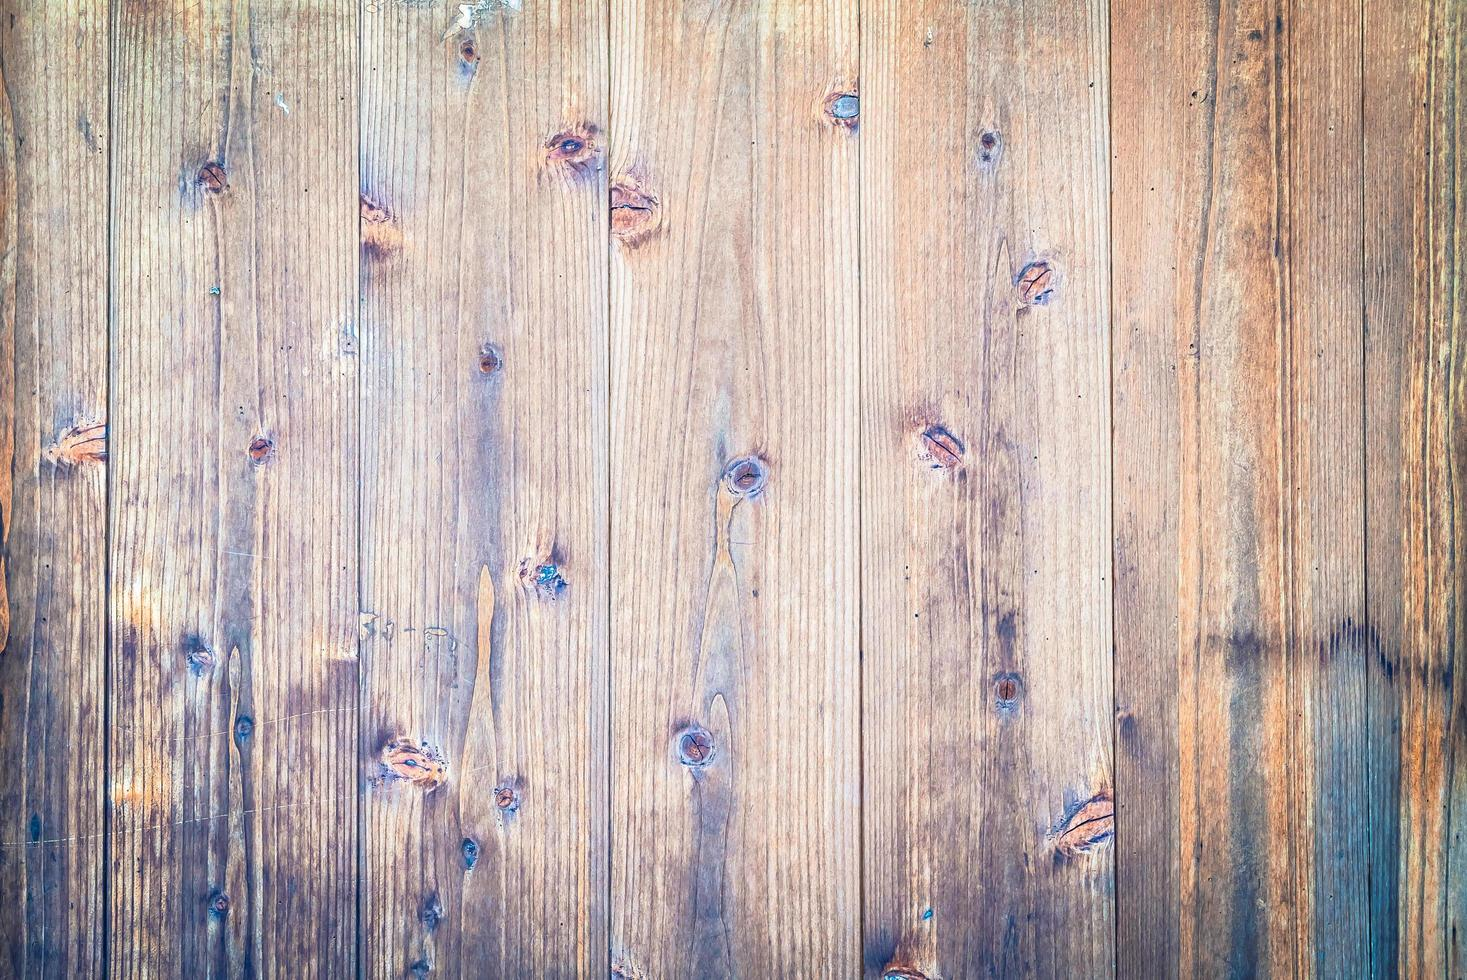 Old vintage wood texture background photo